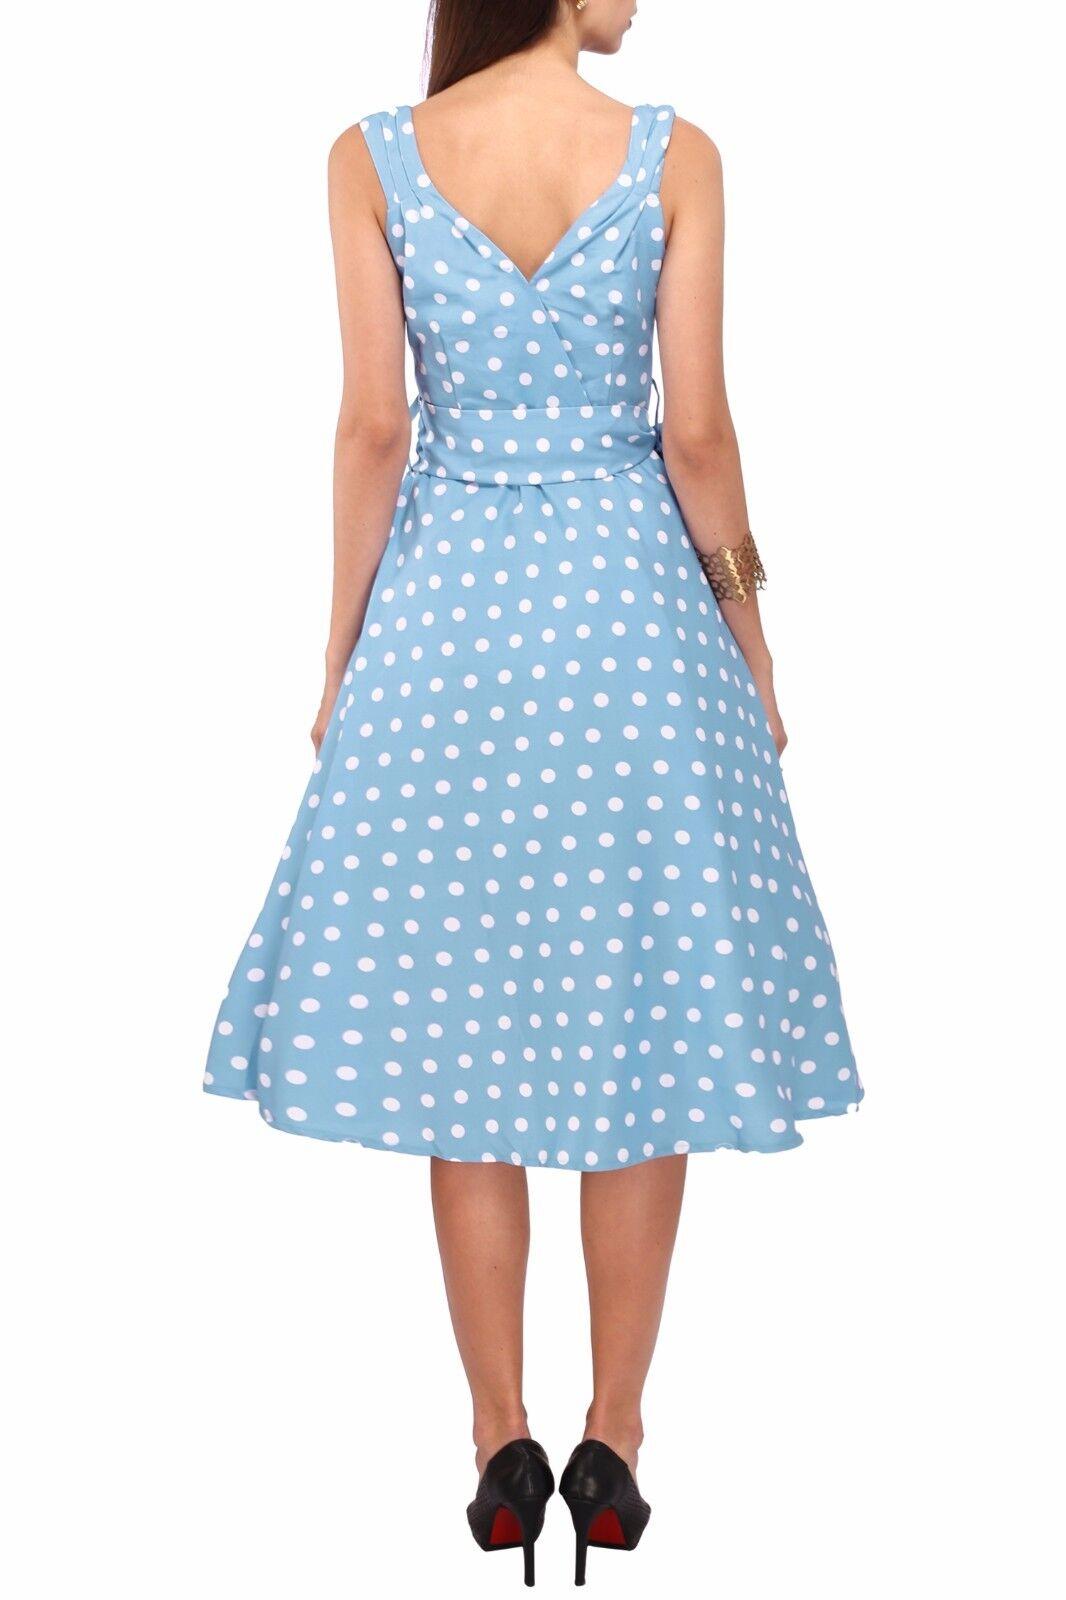 Miss Lavish Dress 50\'s Prom Swing Vintage Rockabilly Retro Polka Dot ...